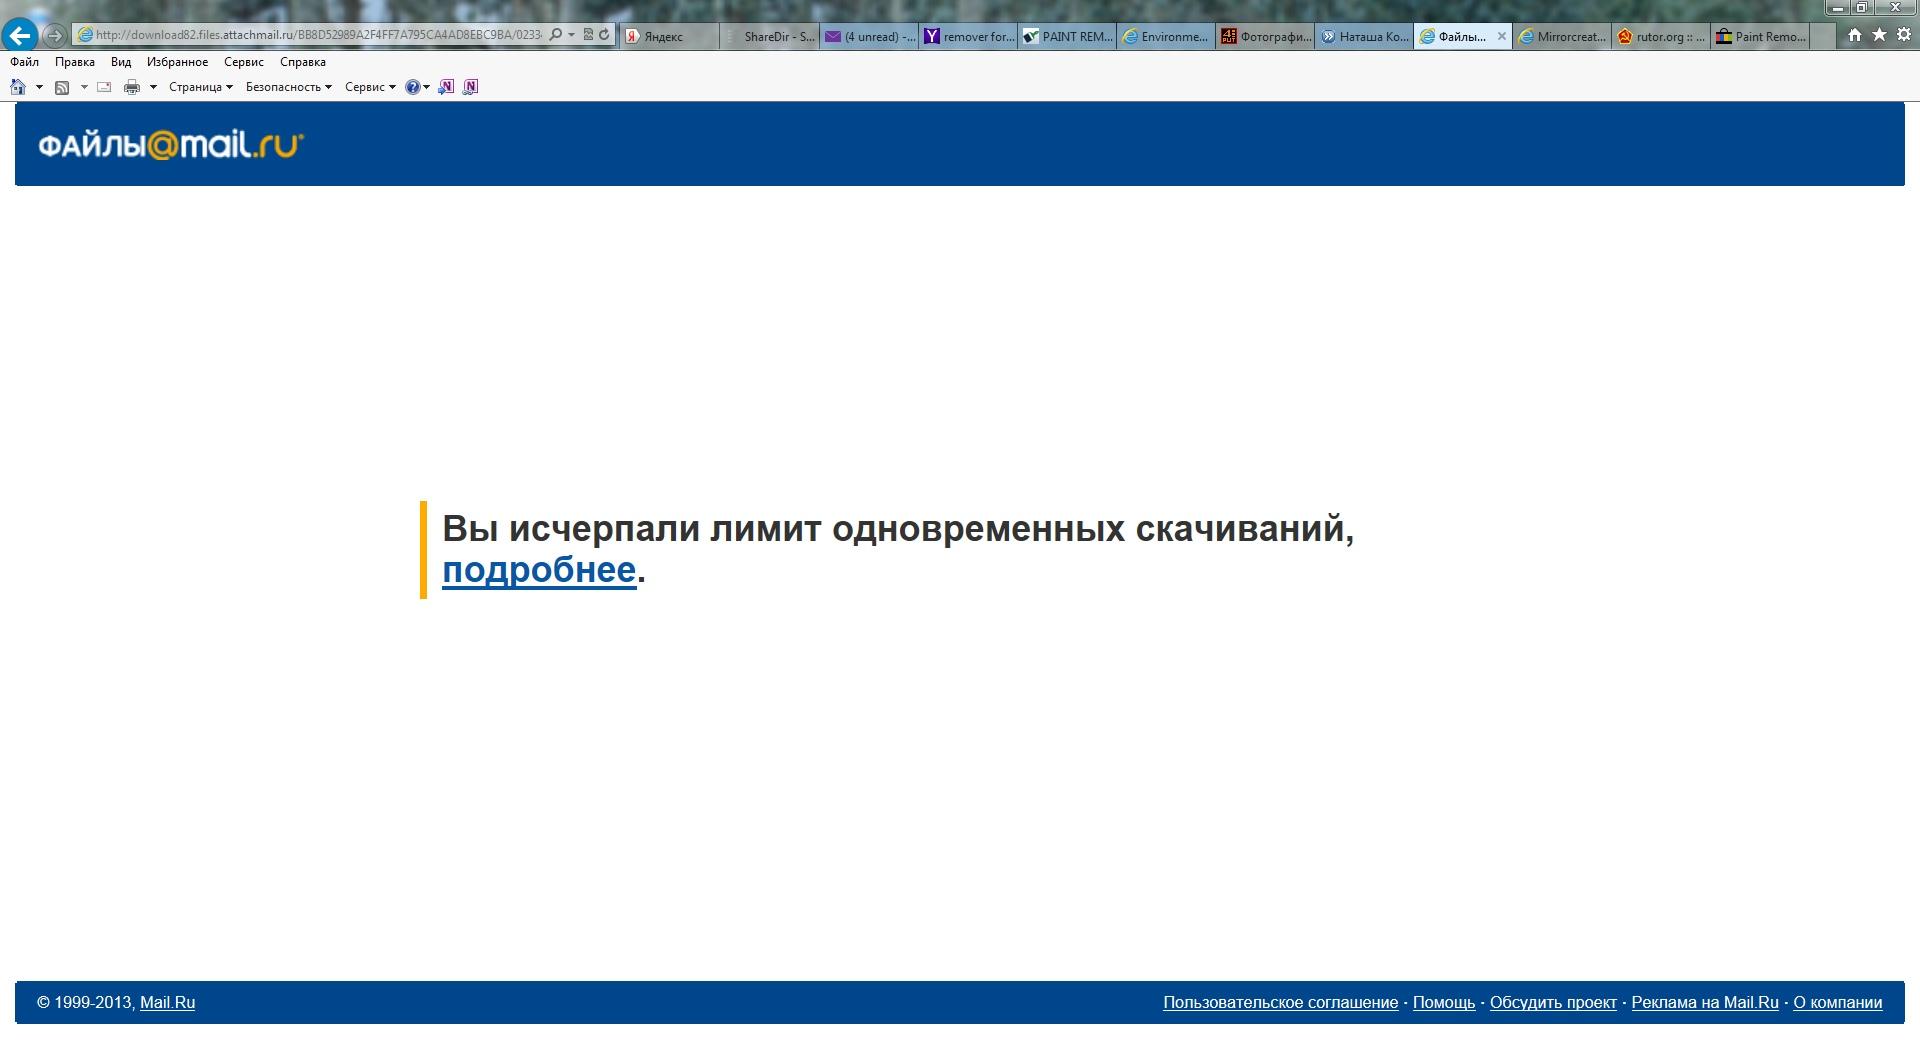 http://4put.ru/pictures/max/750/2306591.jpg